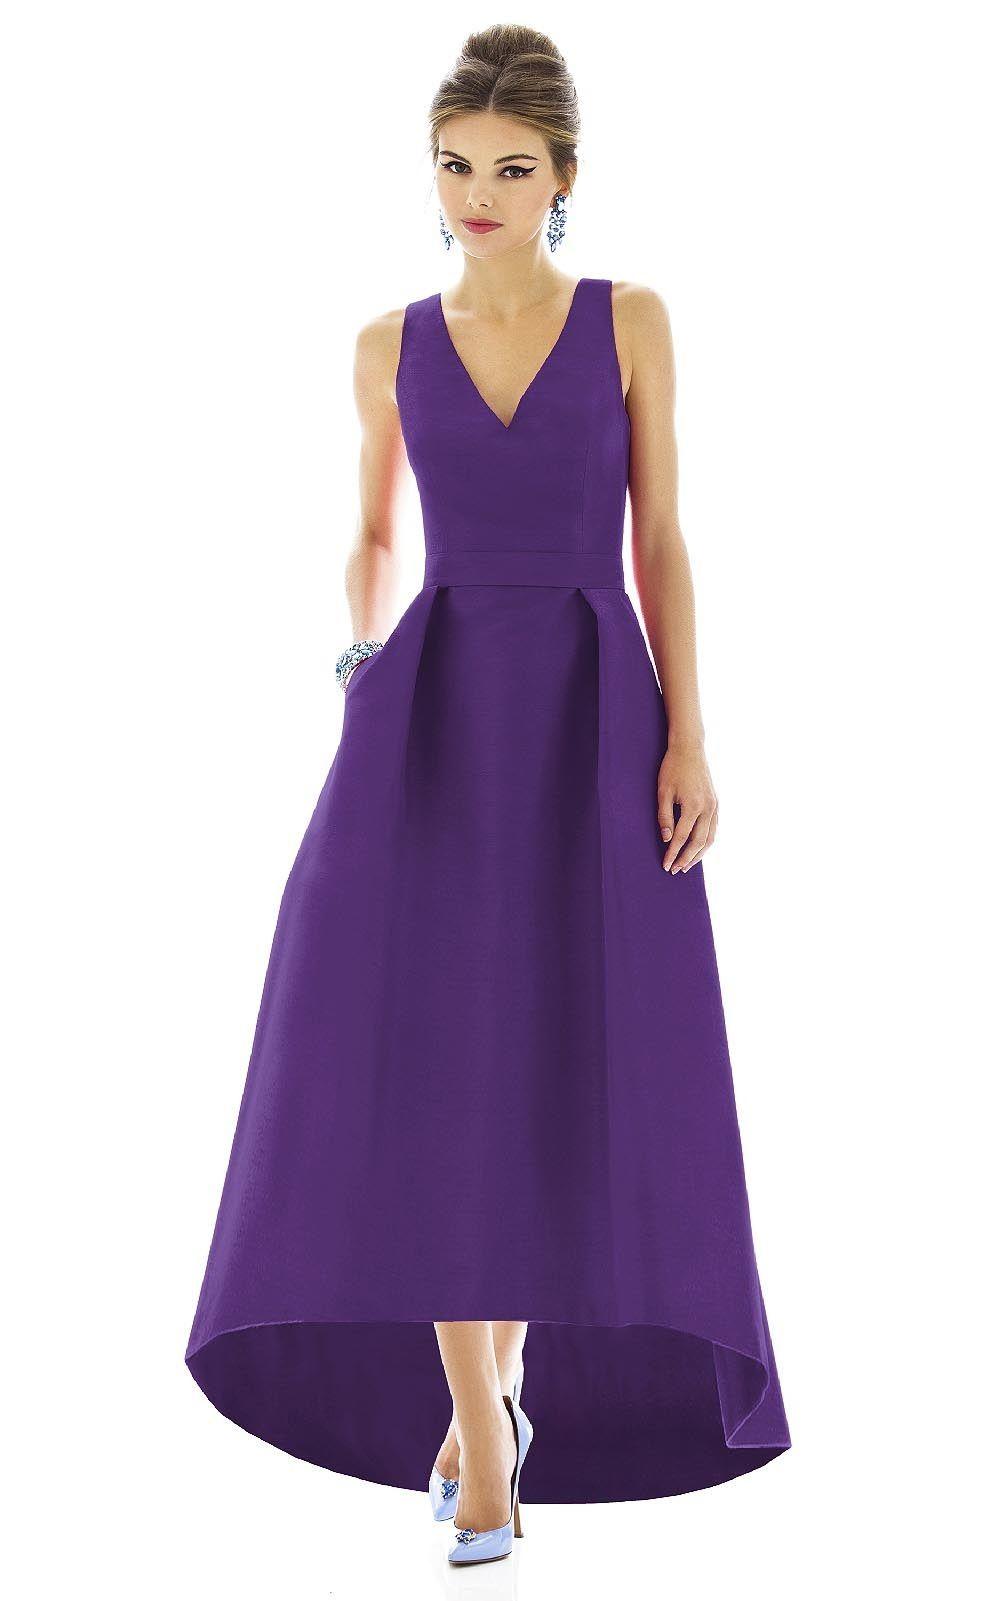 Wedding Apparel Dresses, Bridesmaid Dresses,Purple Ruched Deep V ...